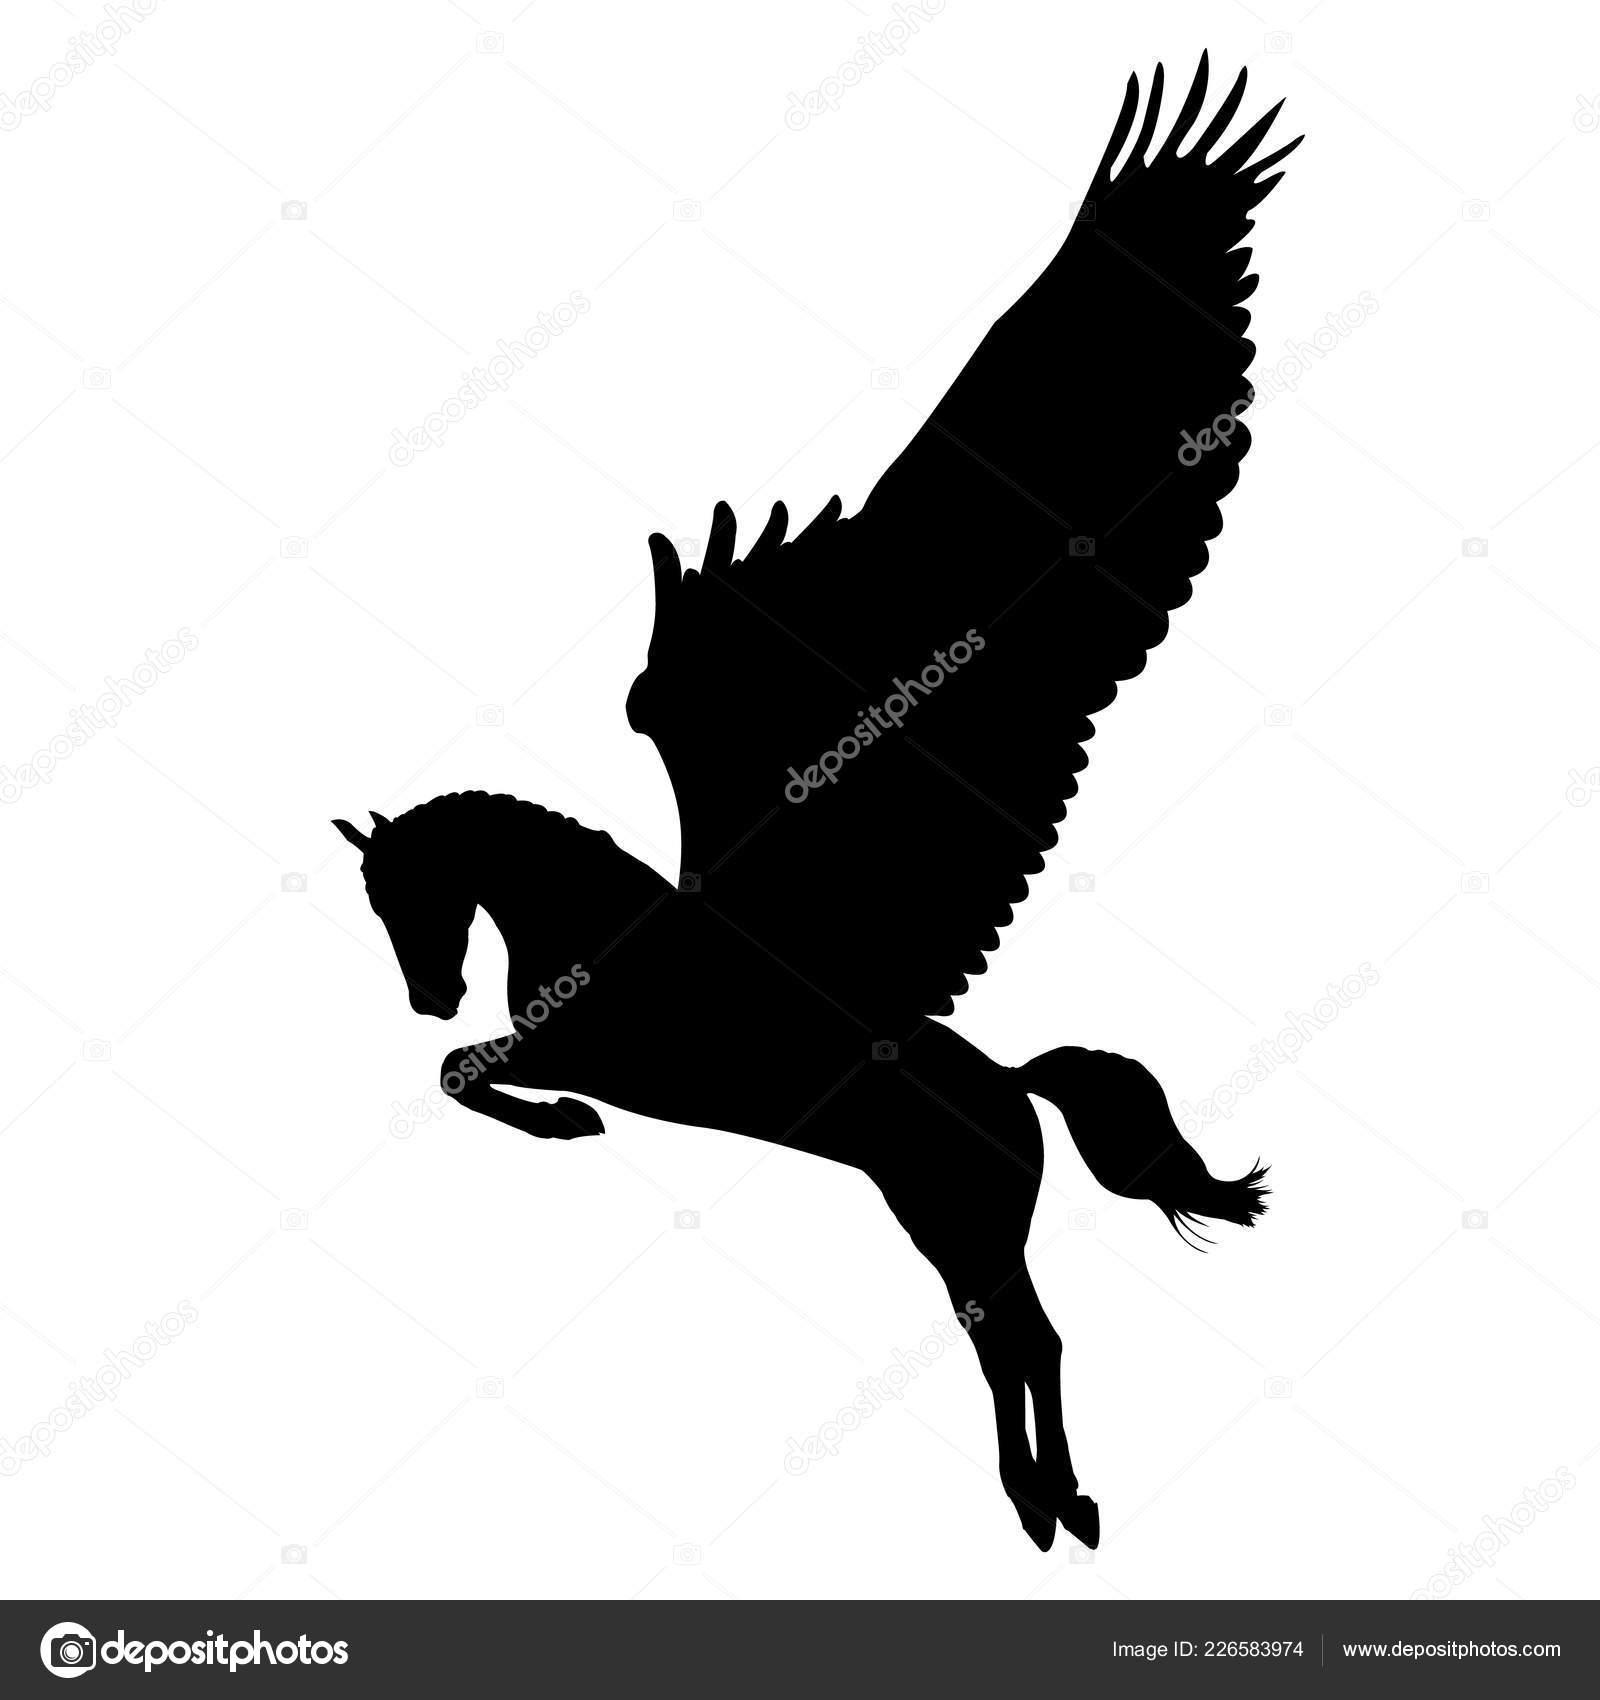 Vector Silhouette Pegasus Mythical Animal Horse Wings Black Pegasus Profile Stock Vector C Olgasalt 226583974